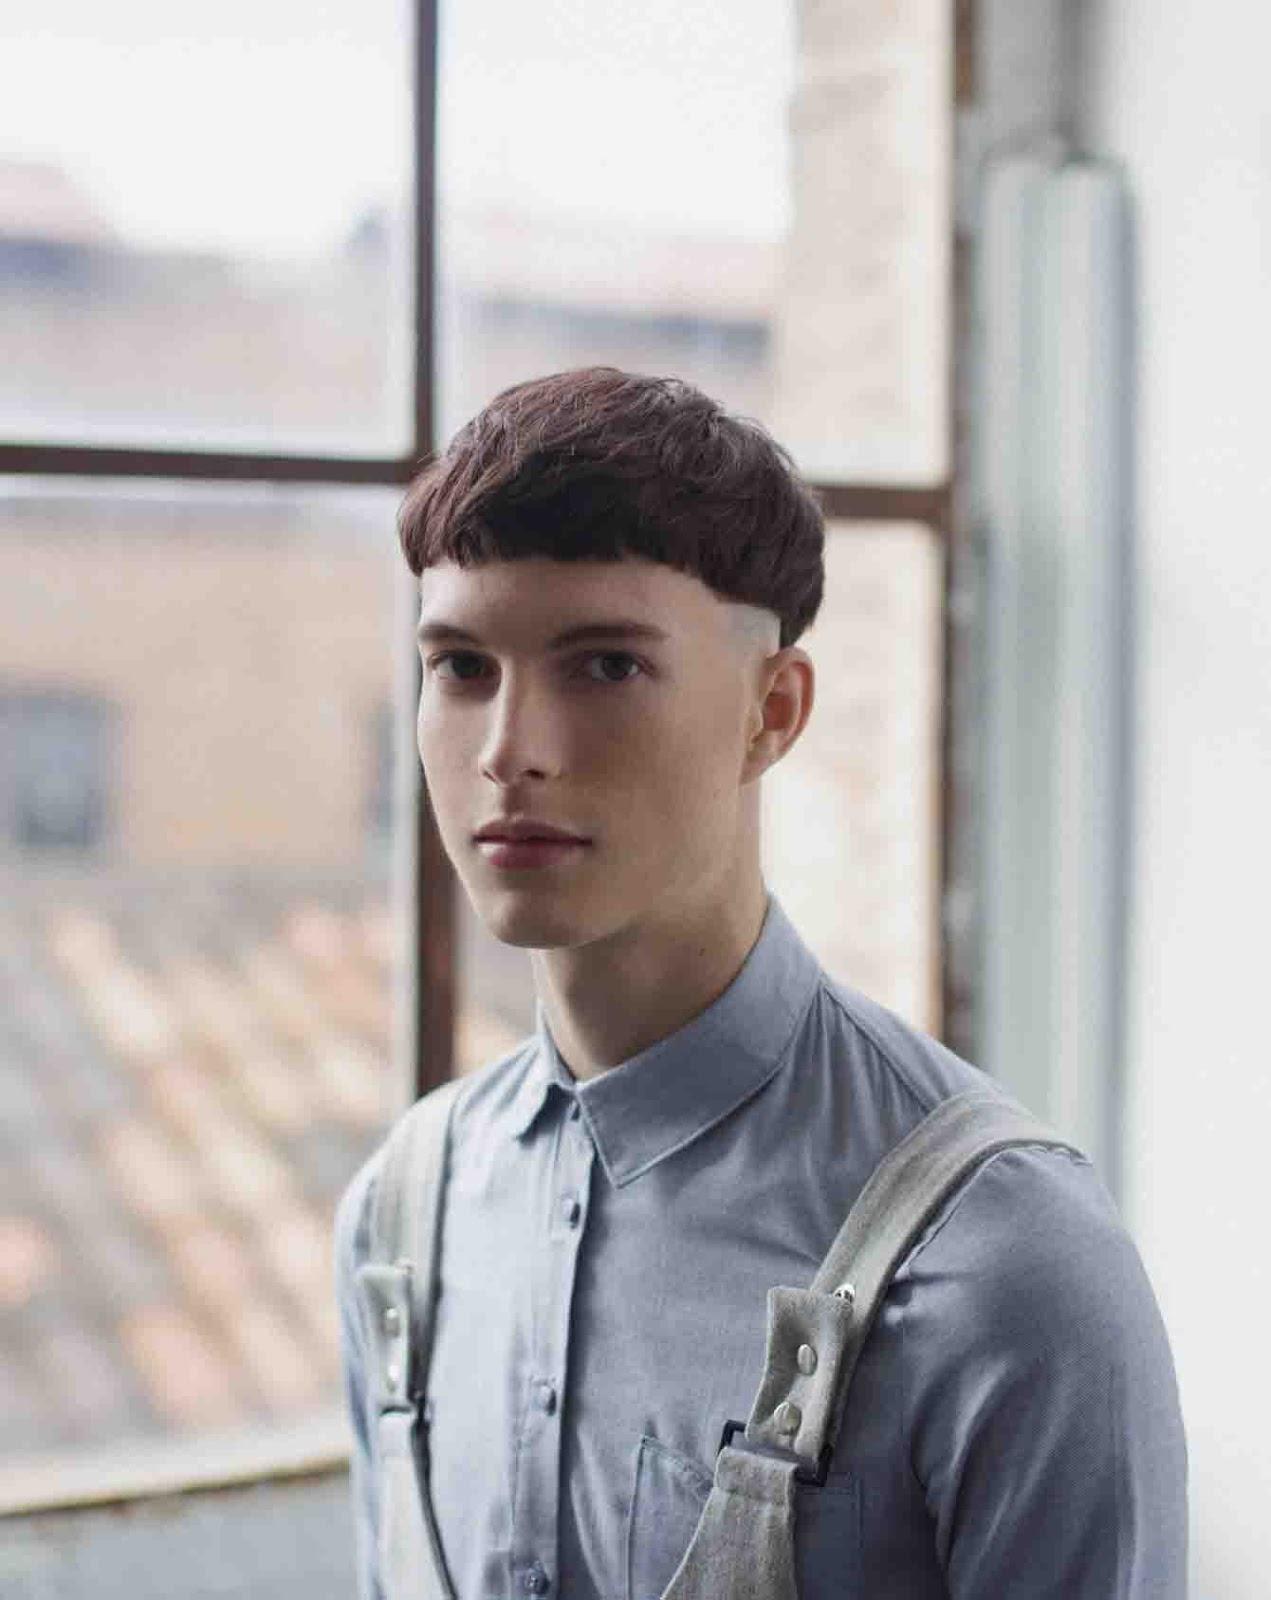 cortes de pelo para hombres.2020